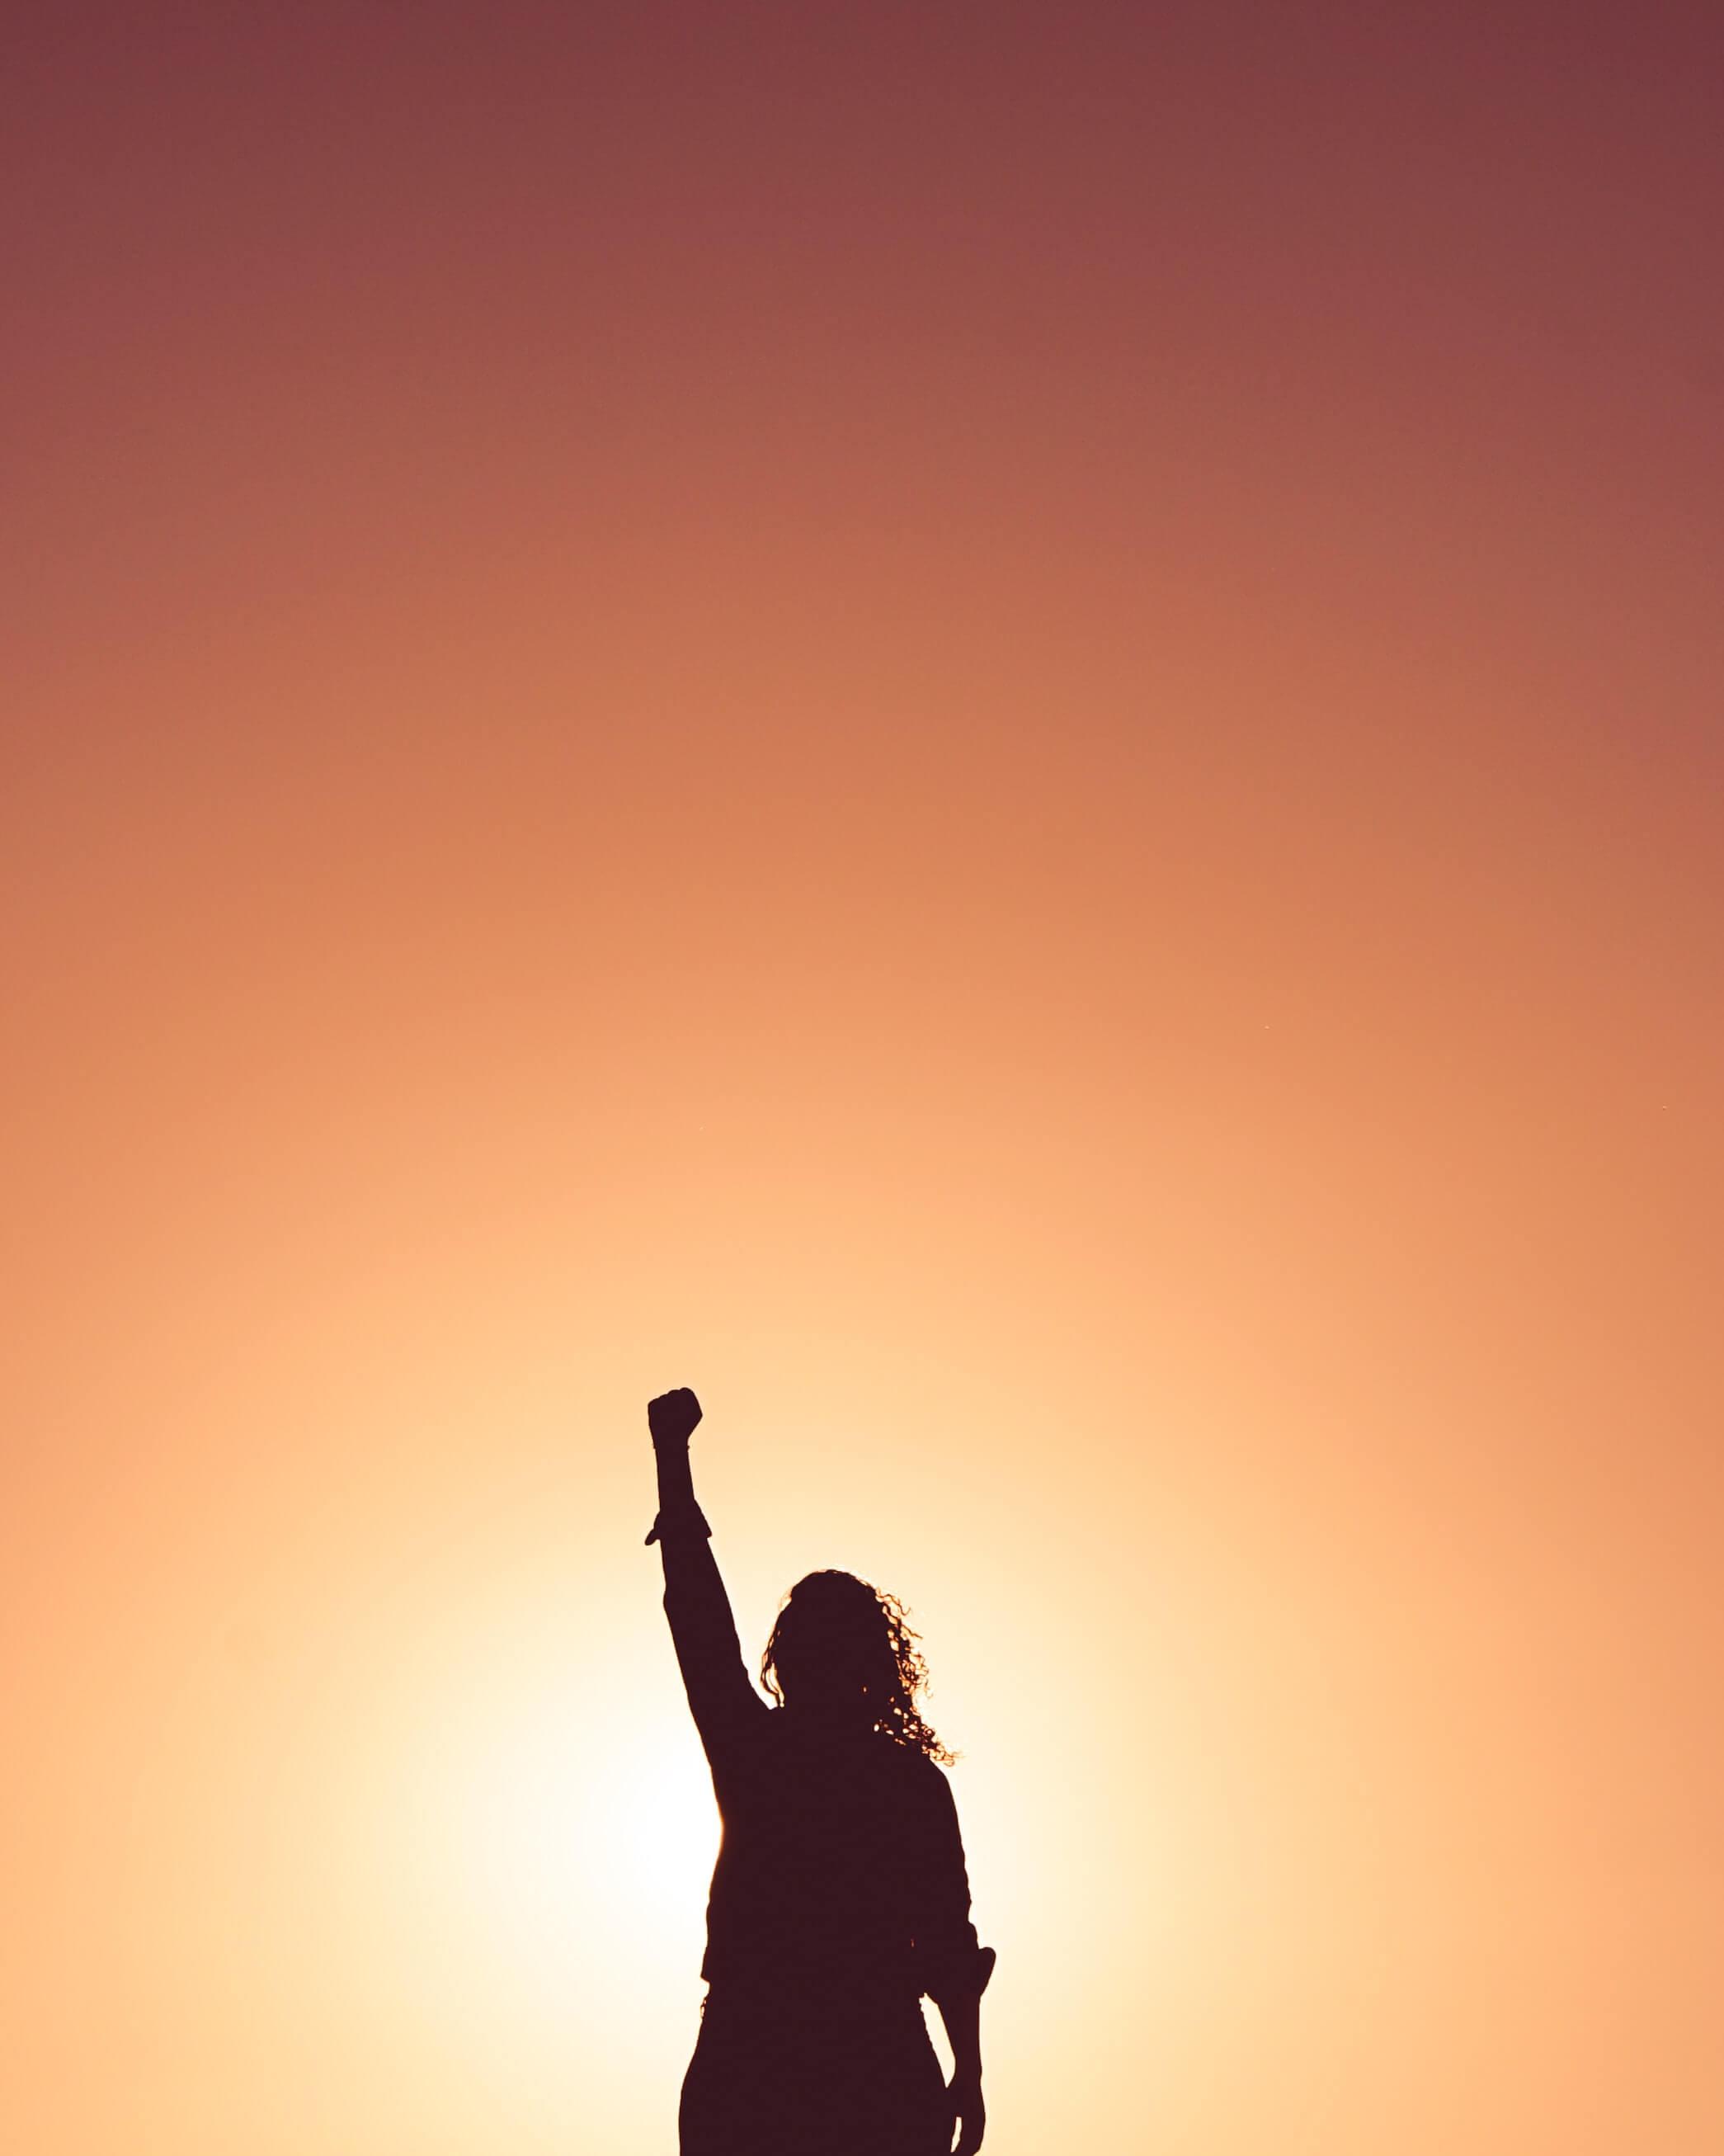 woman celebrating in the sun